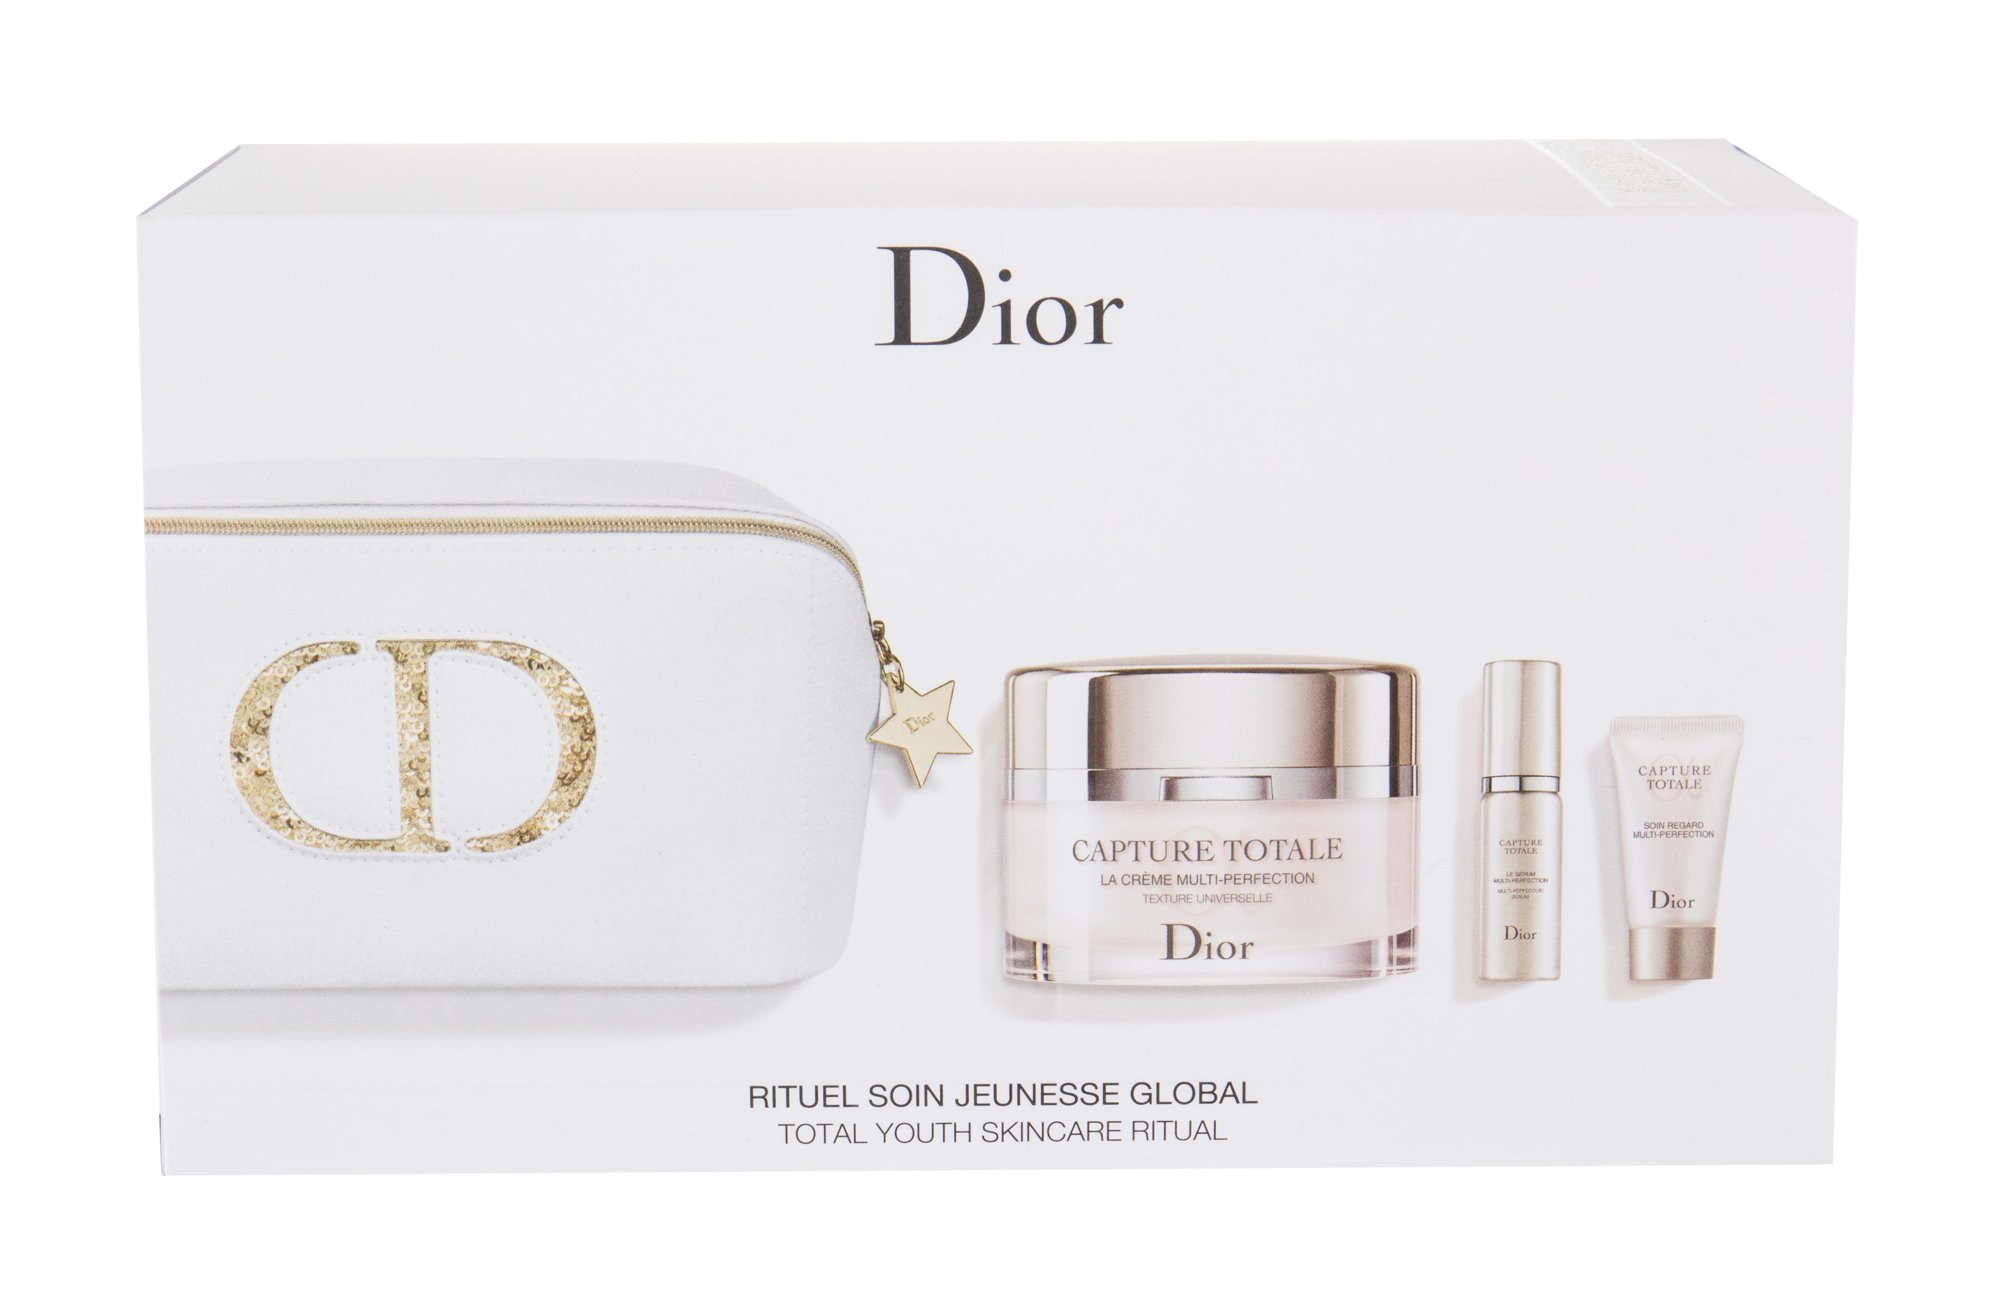 Christian Dior Capture Totale Day Cream 60ml